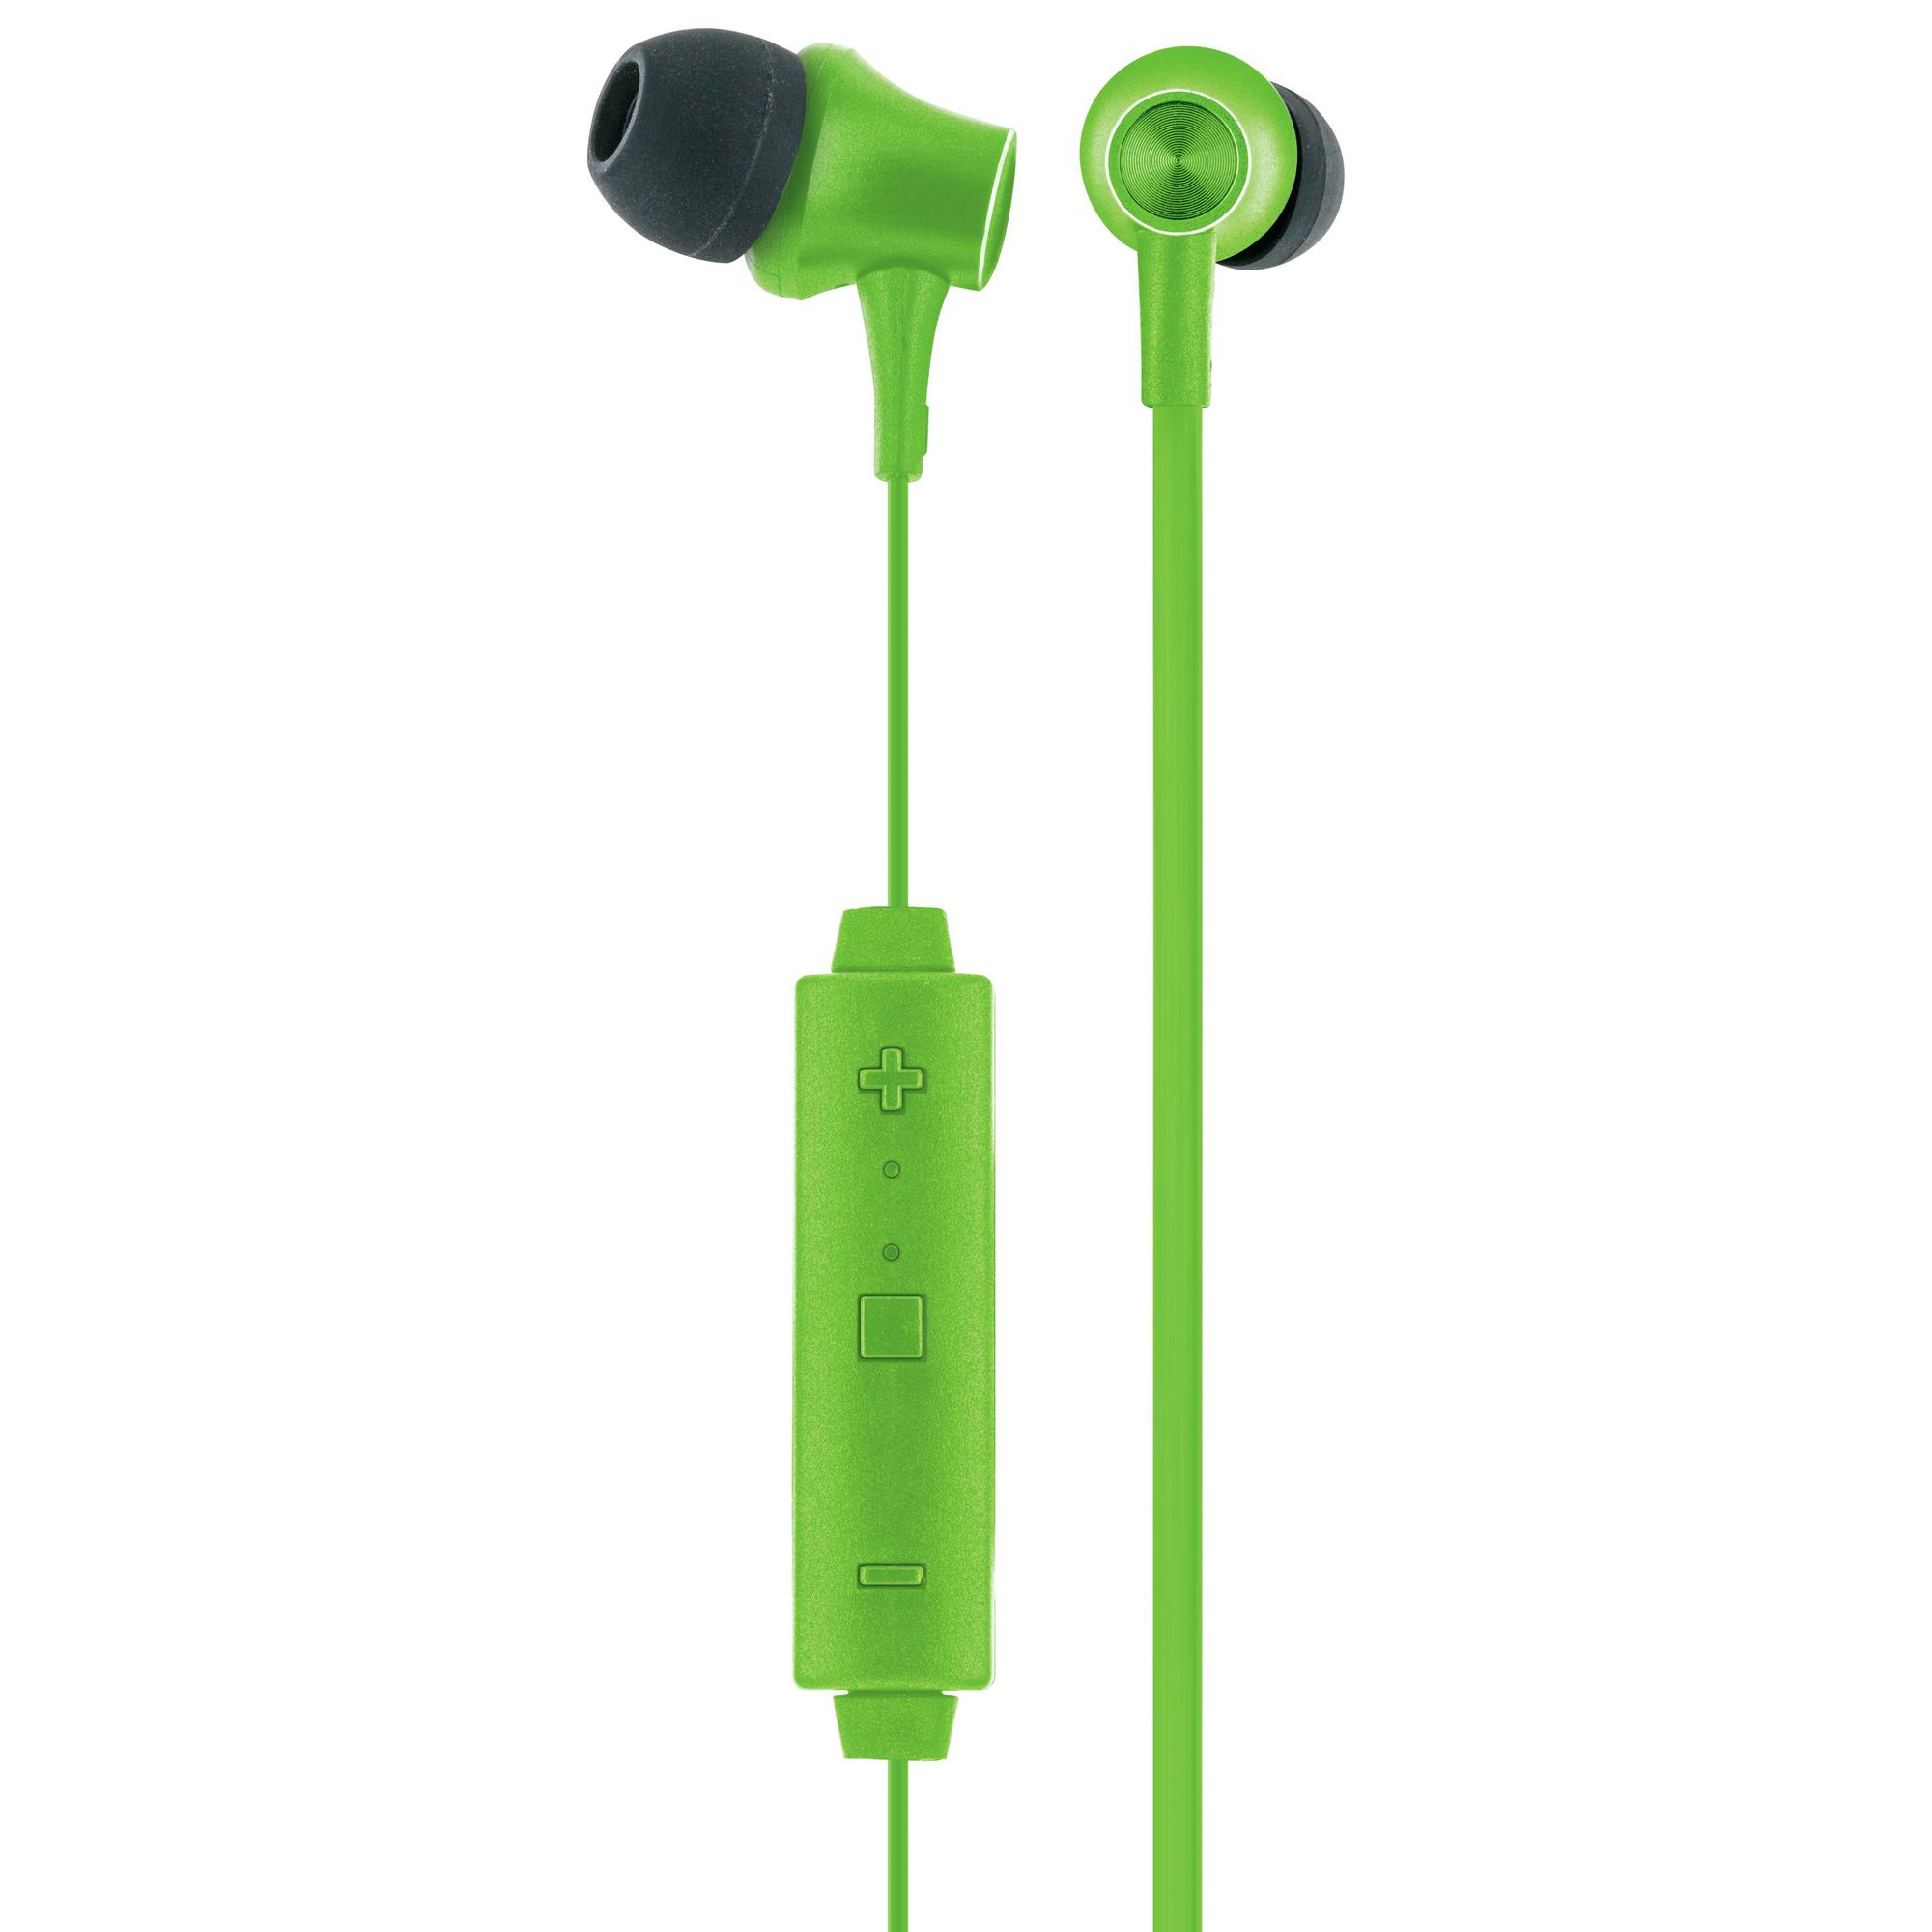 Schwaiger Bluetooth In-Ear-Kopfhörer mit Mikrofon